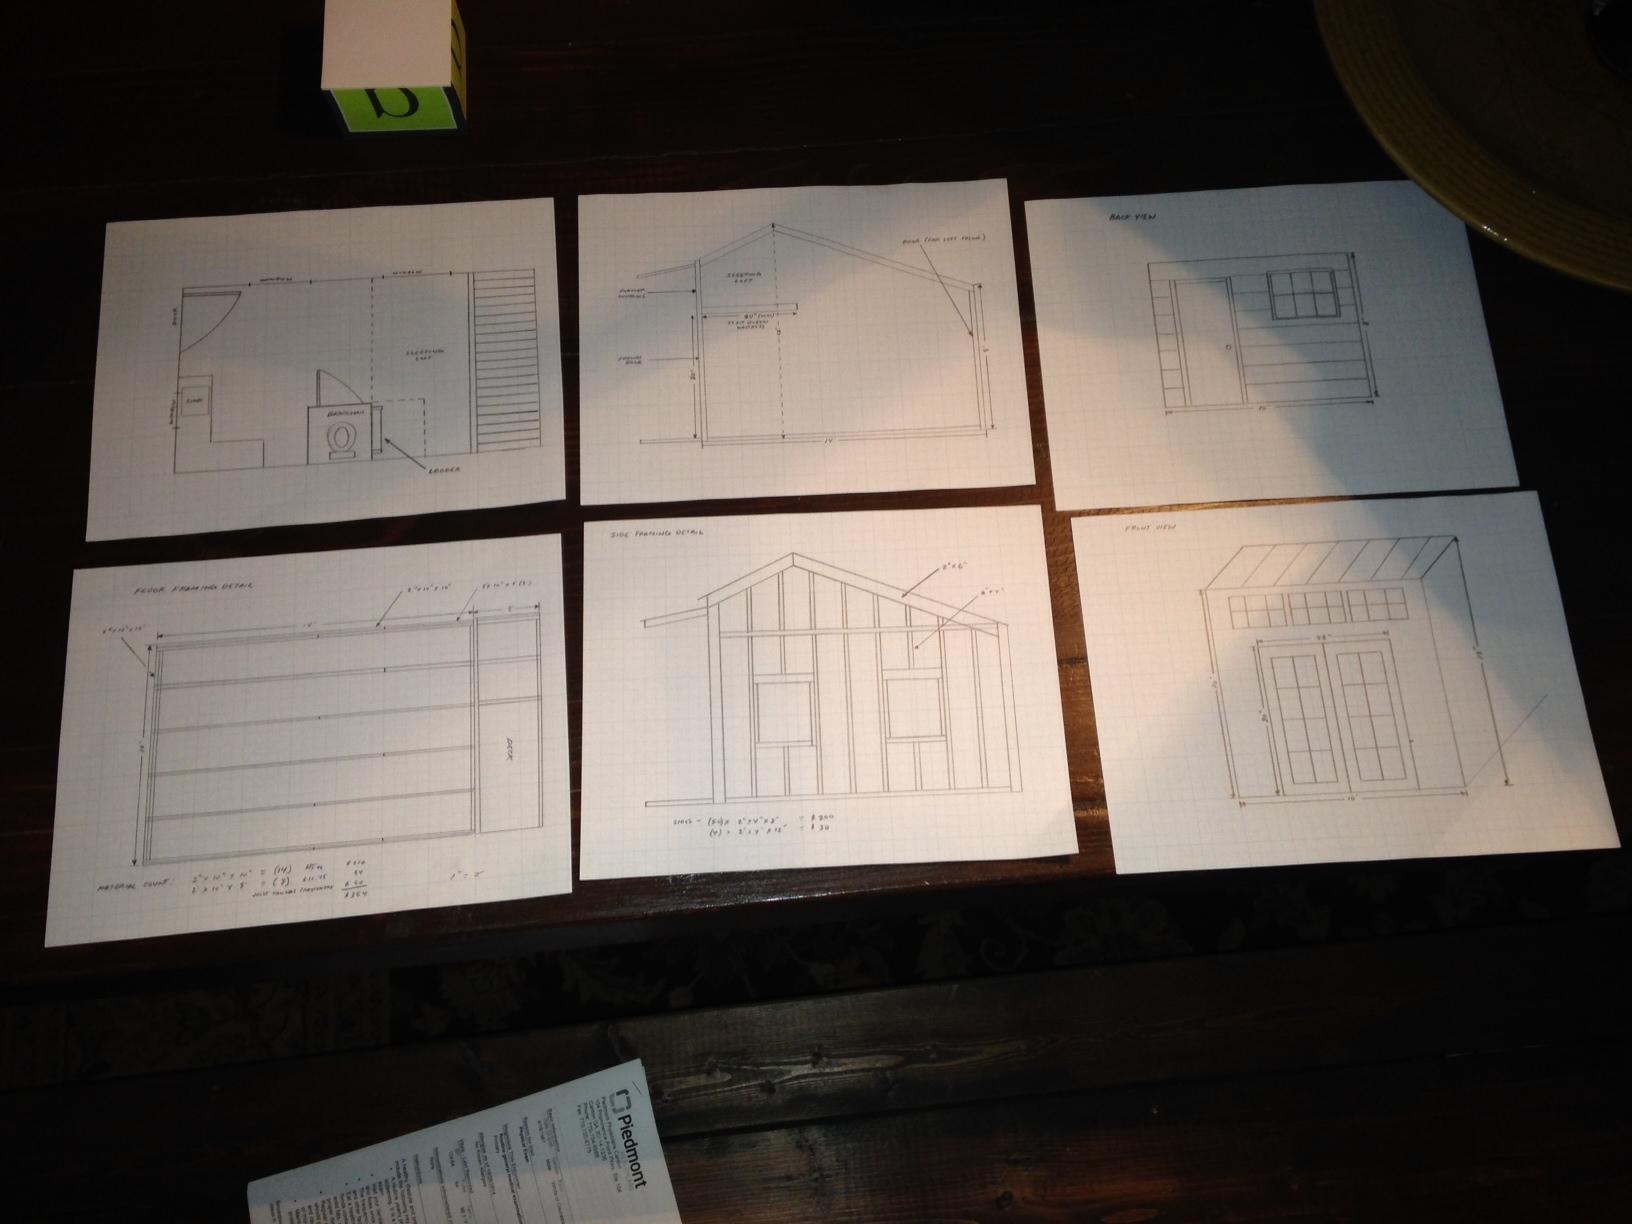 A few rough sketches